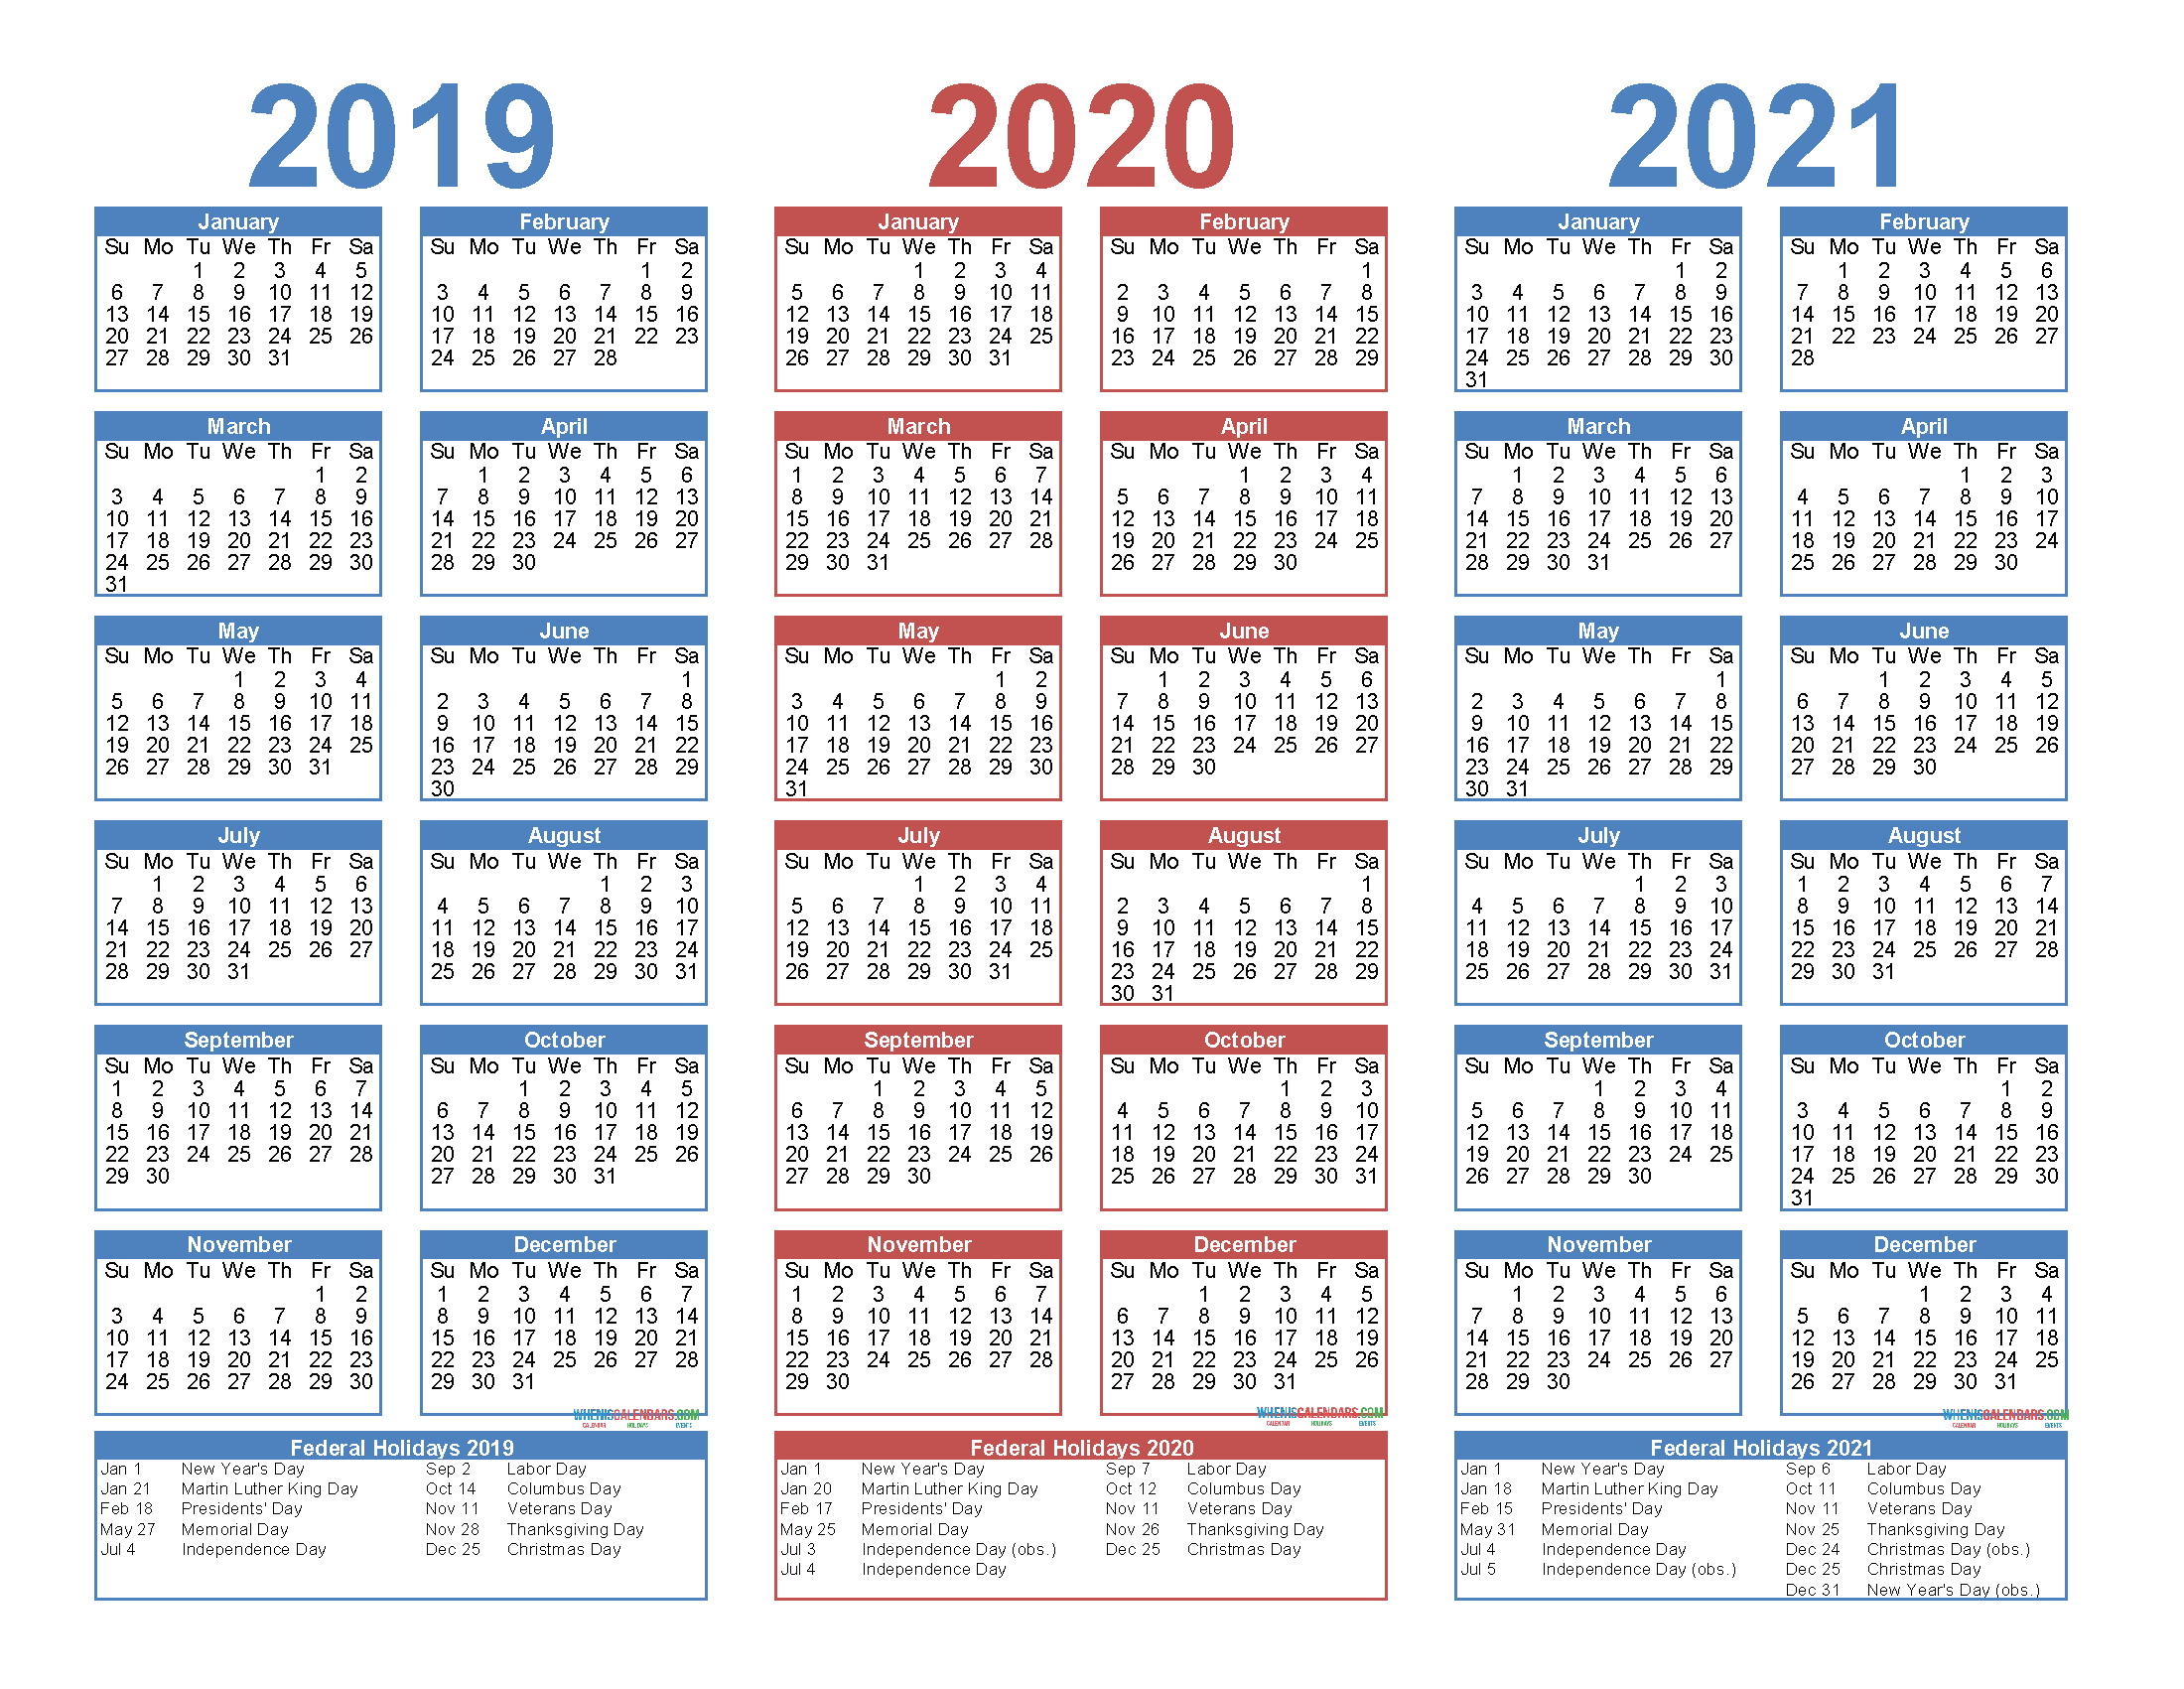 2019 To 2021 3 Year Calendar Printable Free Pdf Word